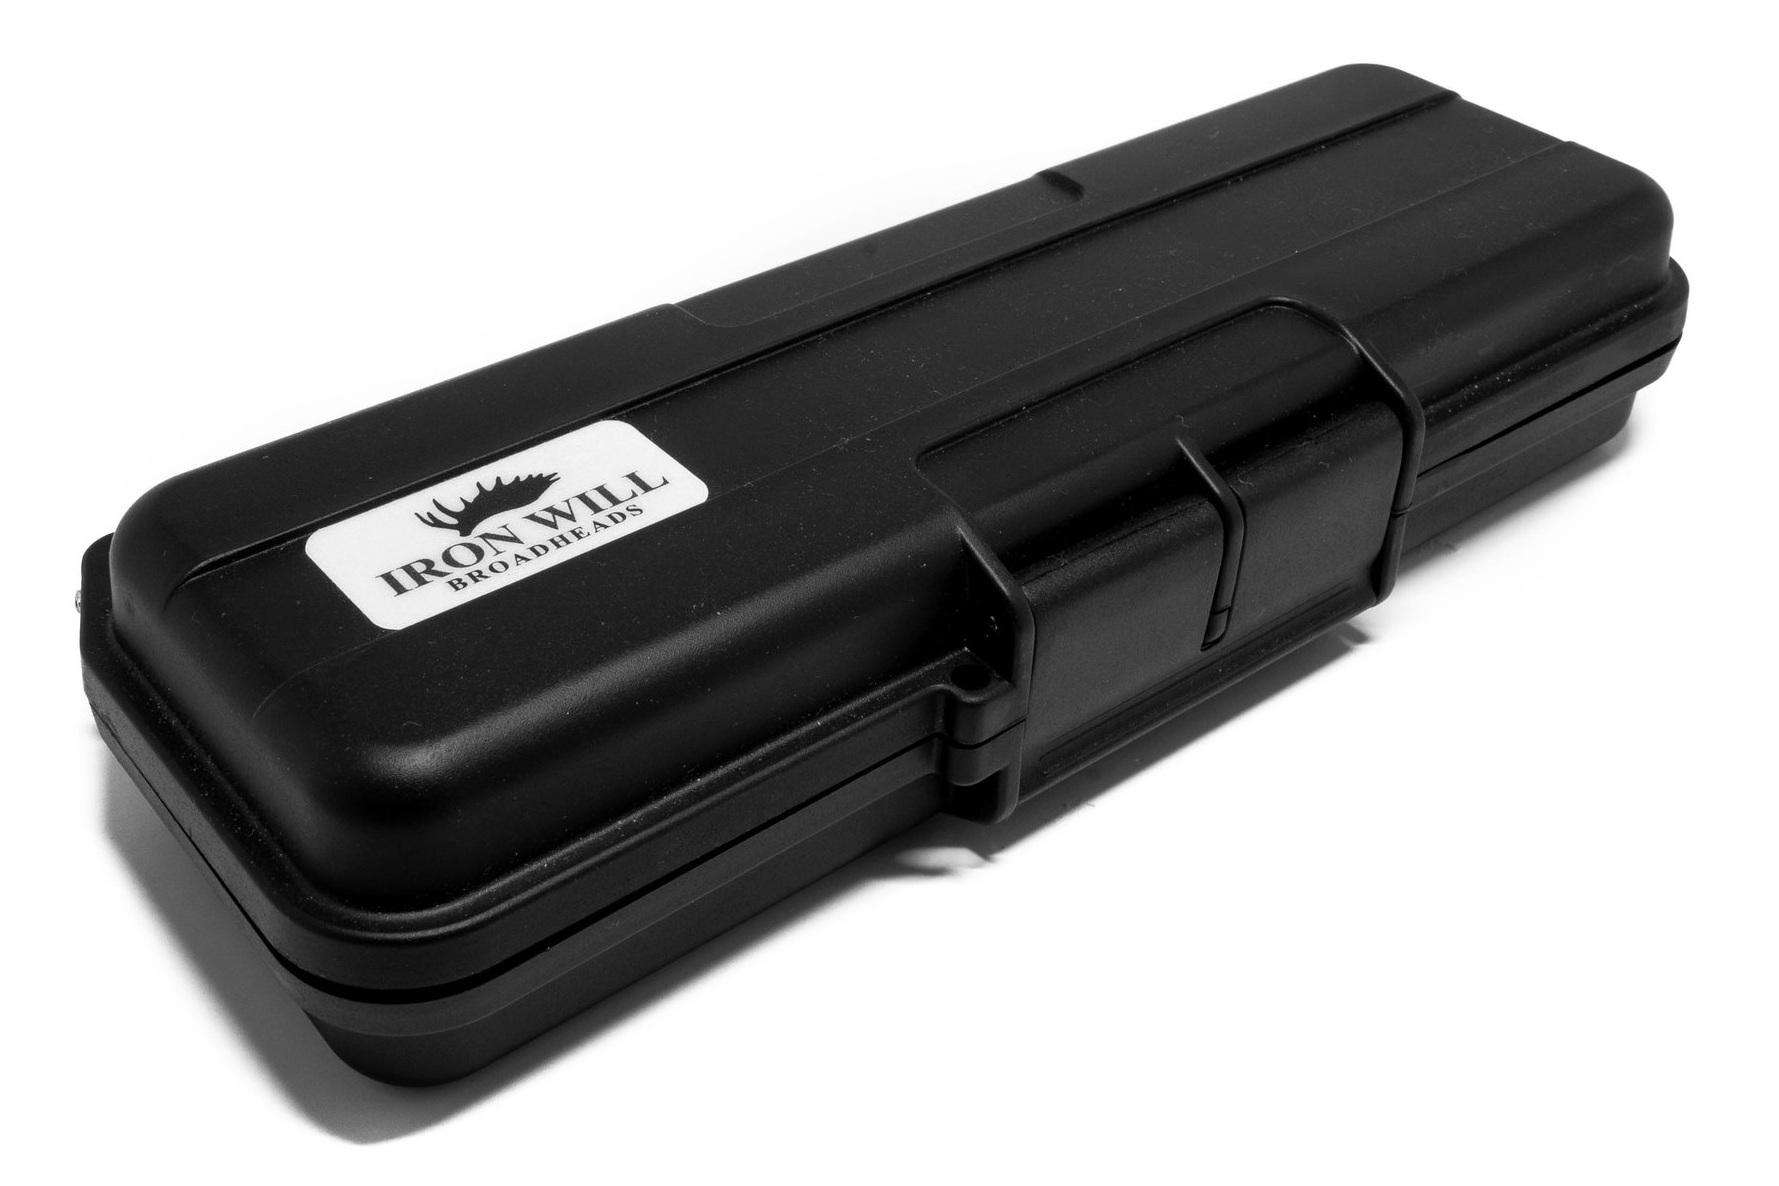 Travel Case - $29.95